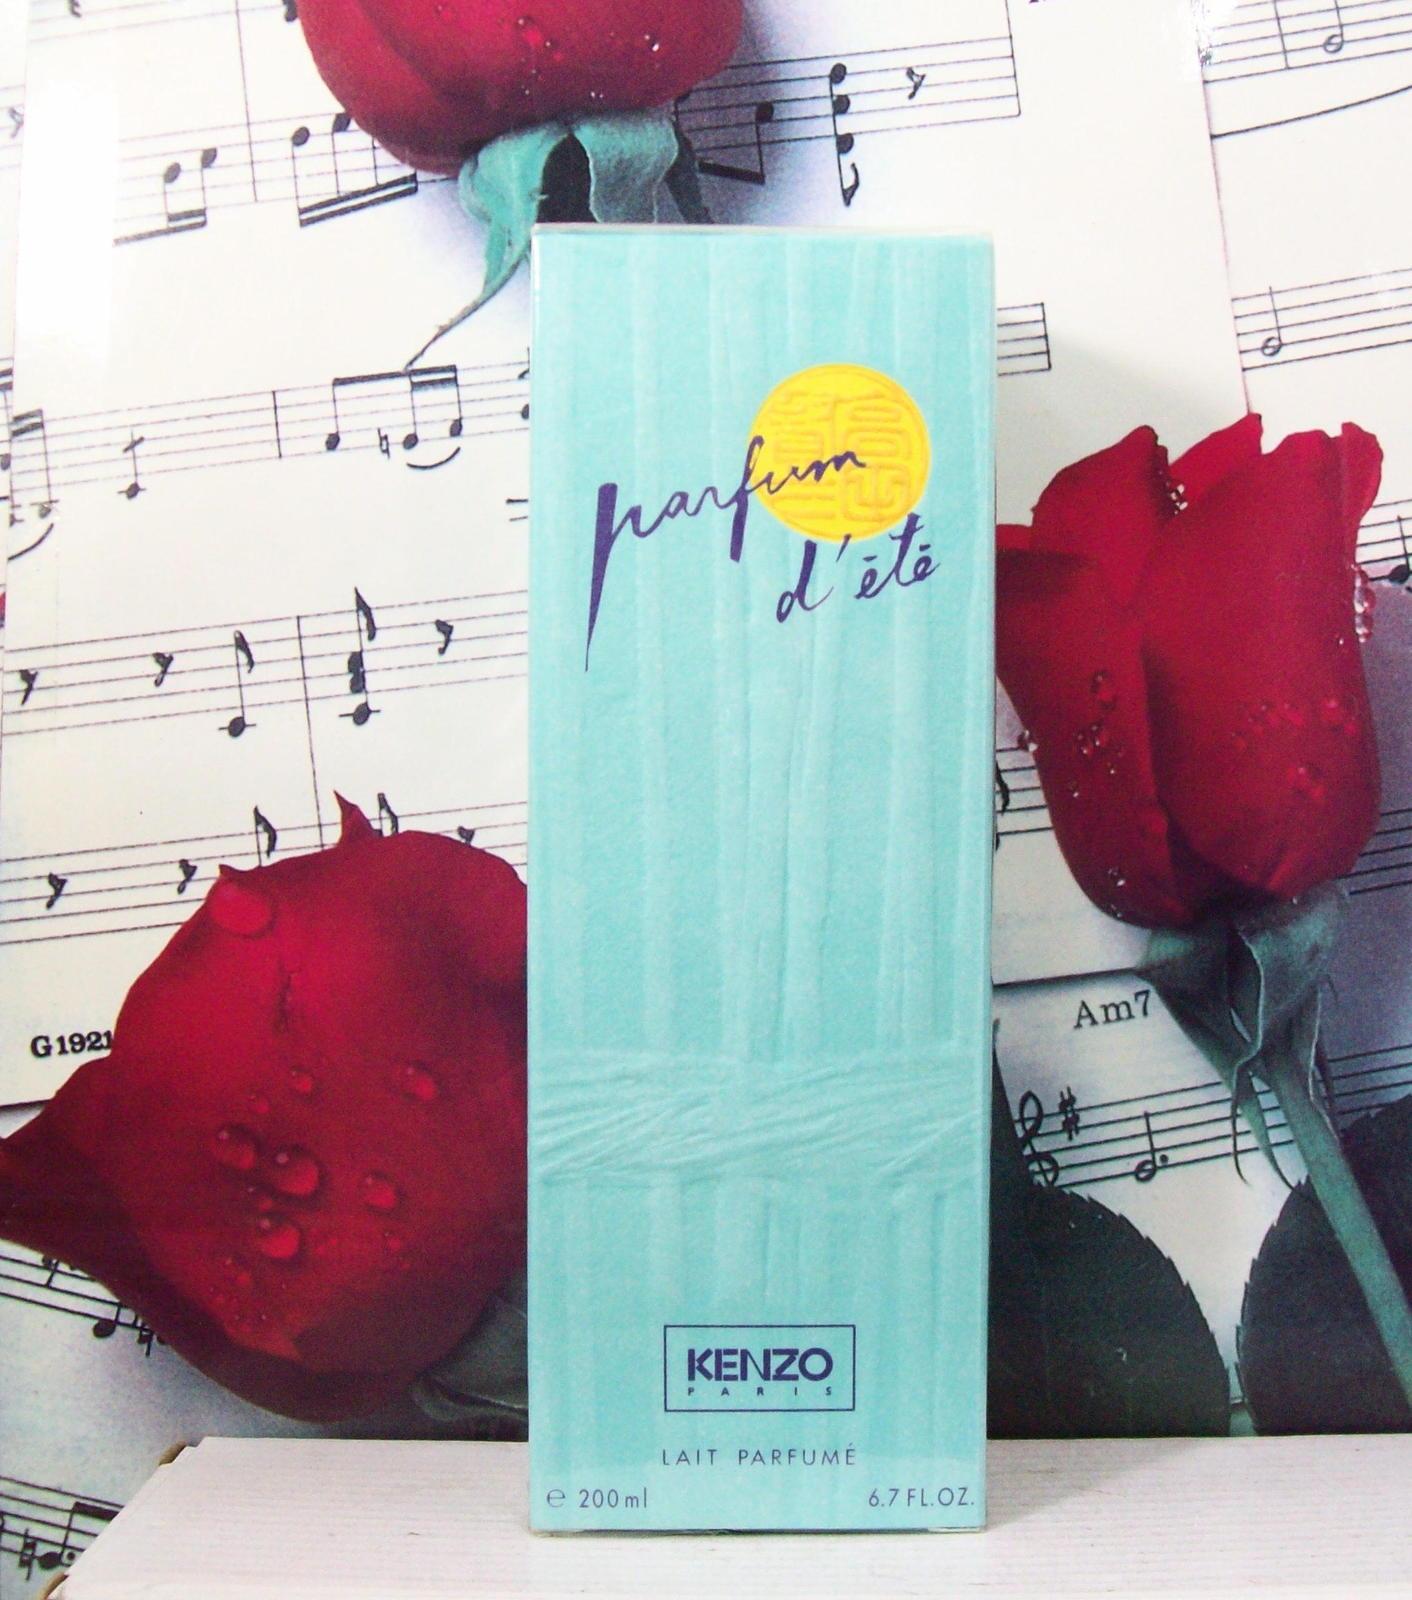 Kenzo Parfum D'ETe Body Lotion 6.7 FL. OZ. NWB. Vintage - $69.99